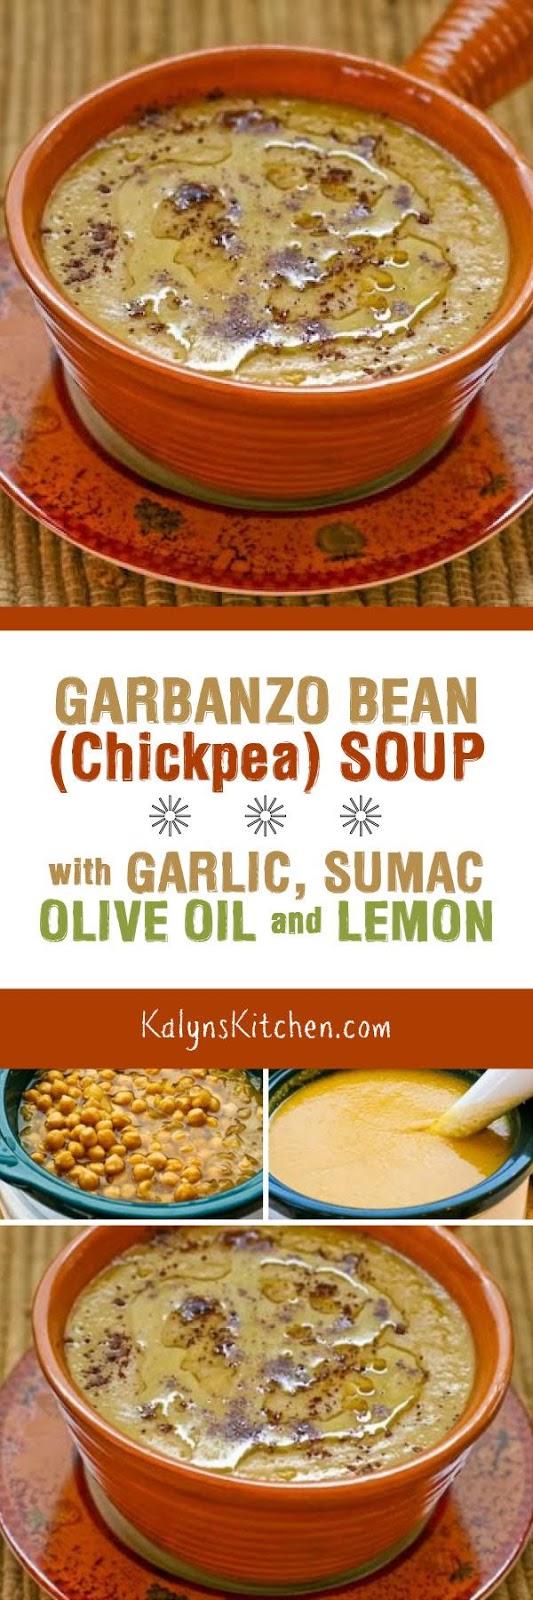 Garbanzo Bean / Chickpea Soup with Garlic, Sumac, Olive ...